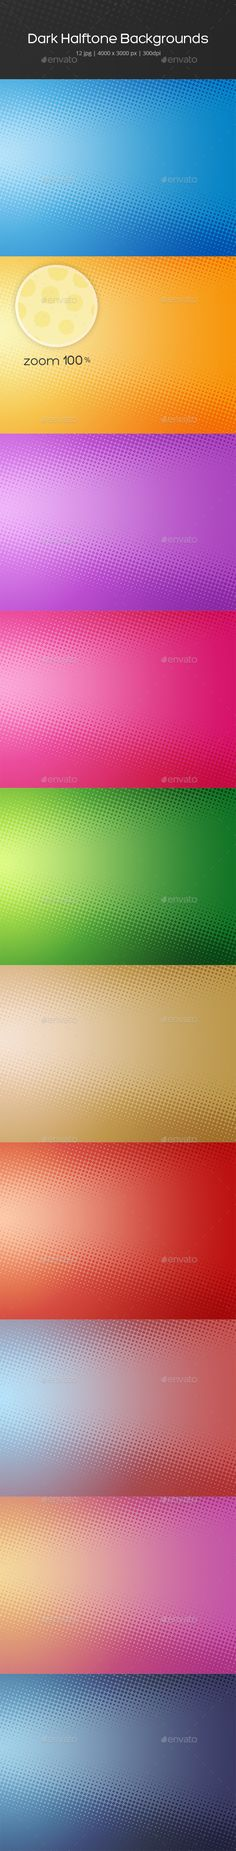 Dark Halftone Backgrounds - Backgrounds Graphics